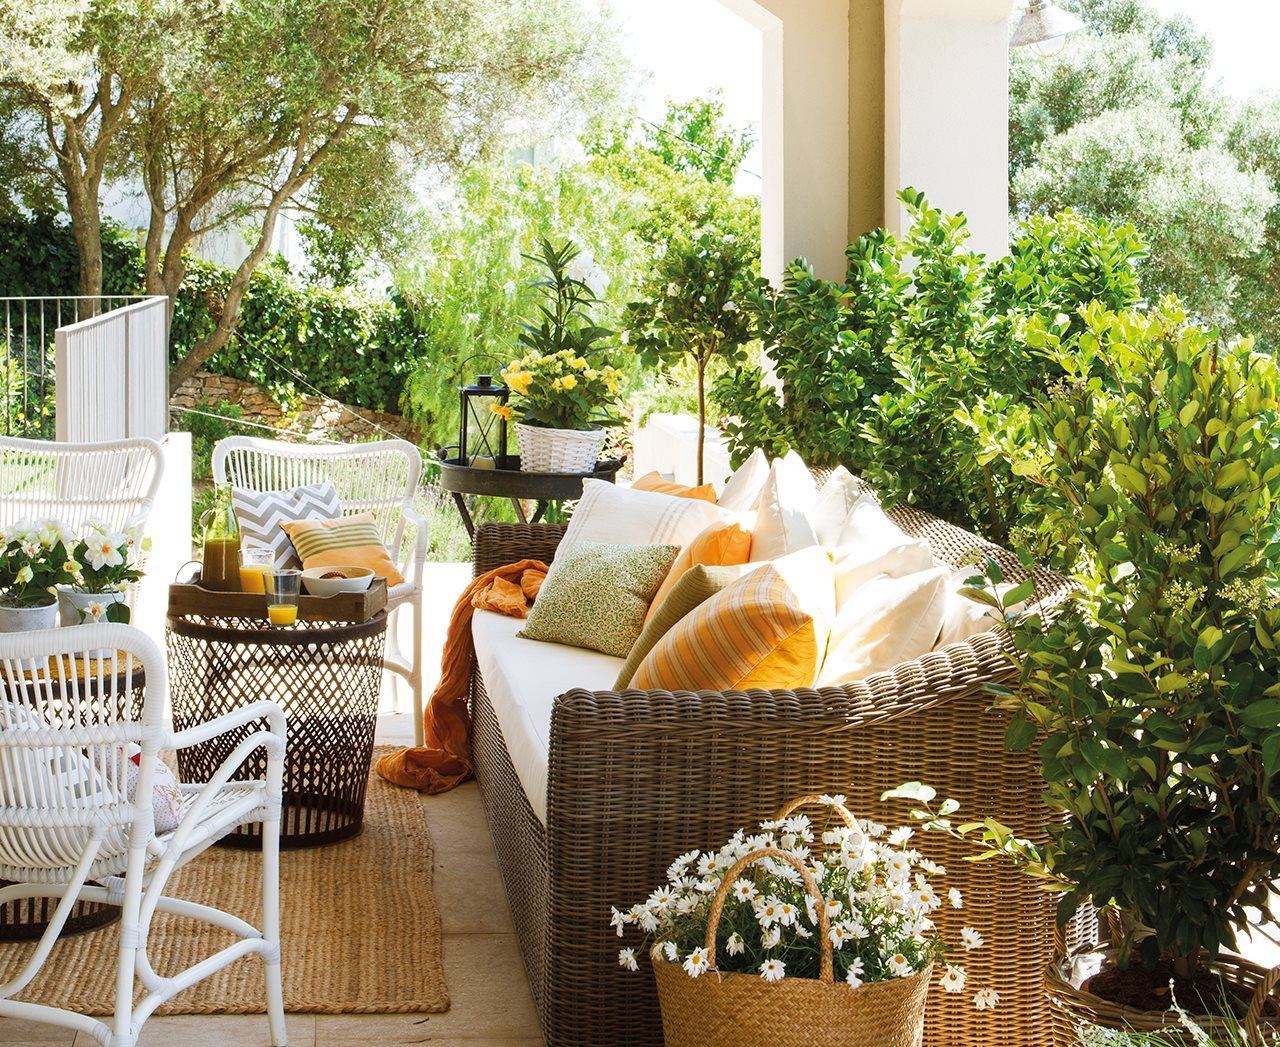 Terraza con muebles de exterior de fibra muebles de for Muebles terraza exterior